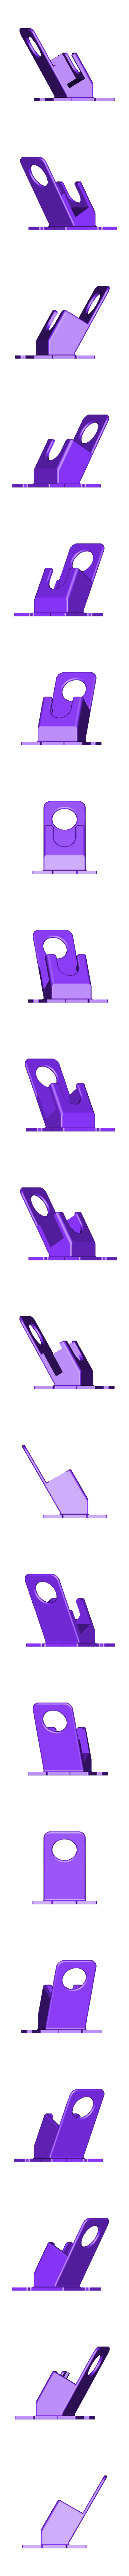 Eachine_vtx__case.stl Download free STL file Touch frame • 3D print template, touchthebitum